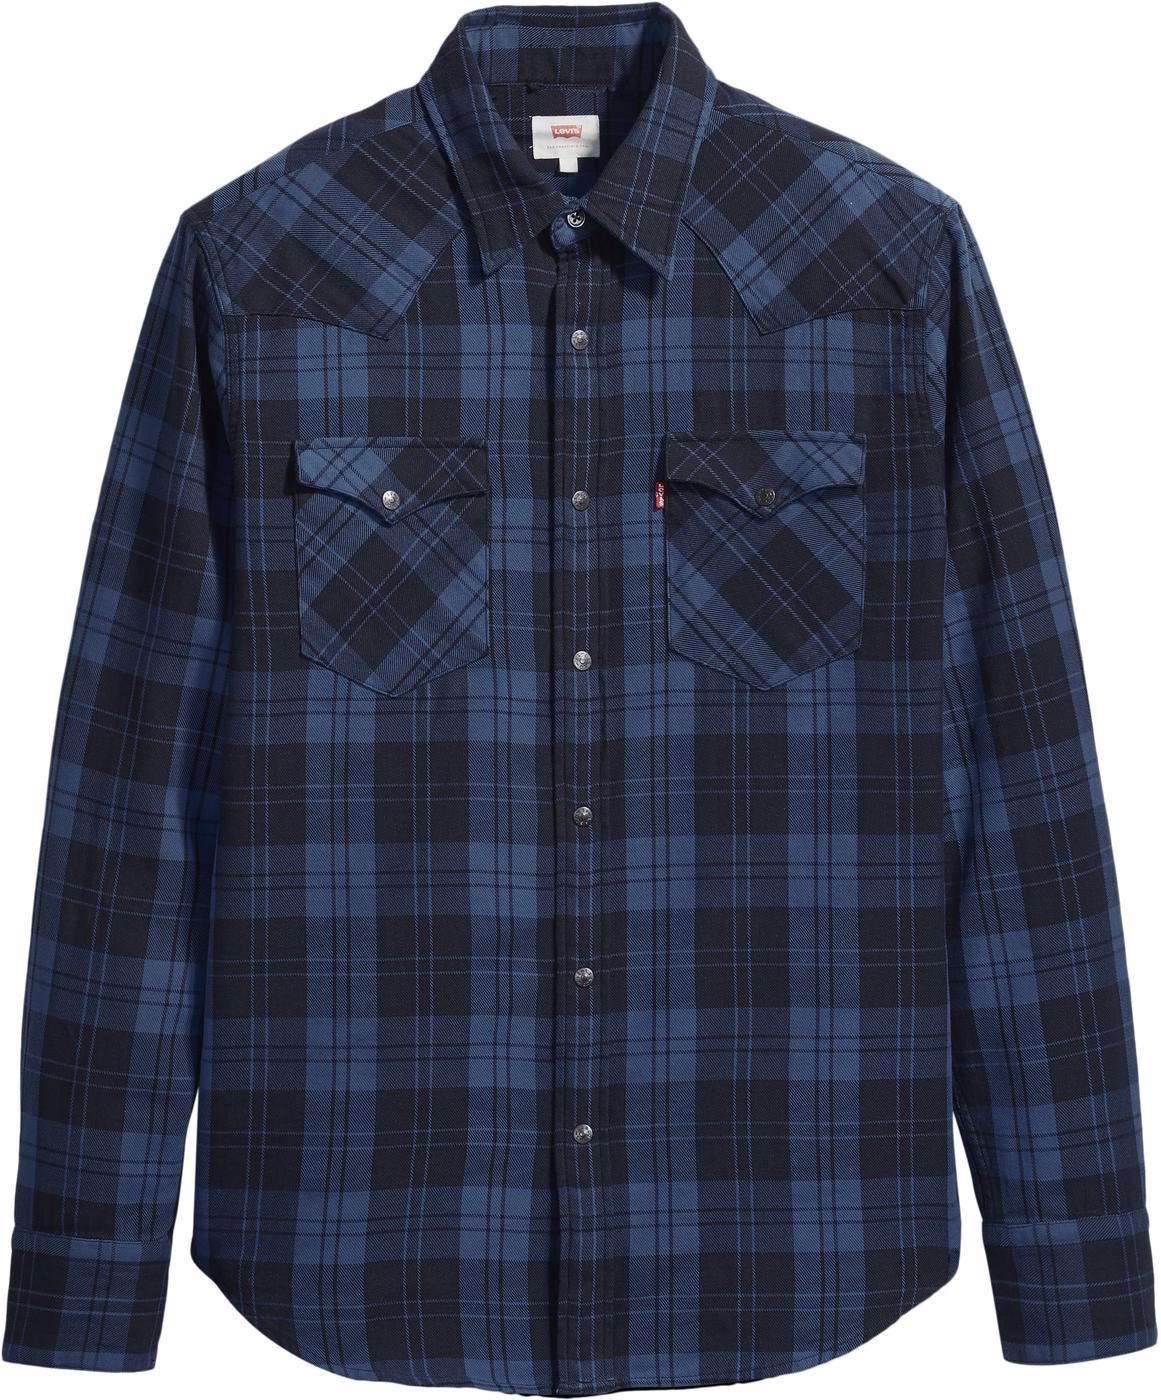 LEVI'S Barstow Retro Mod Check Western Shirt NAVY